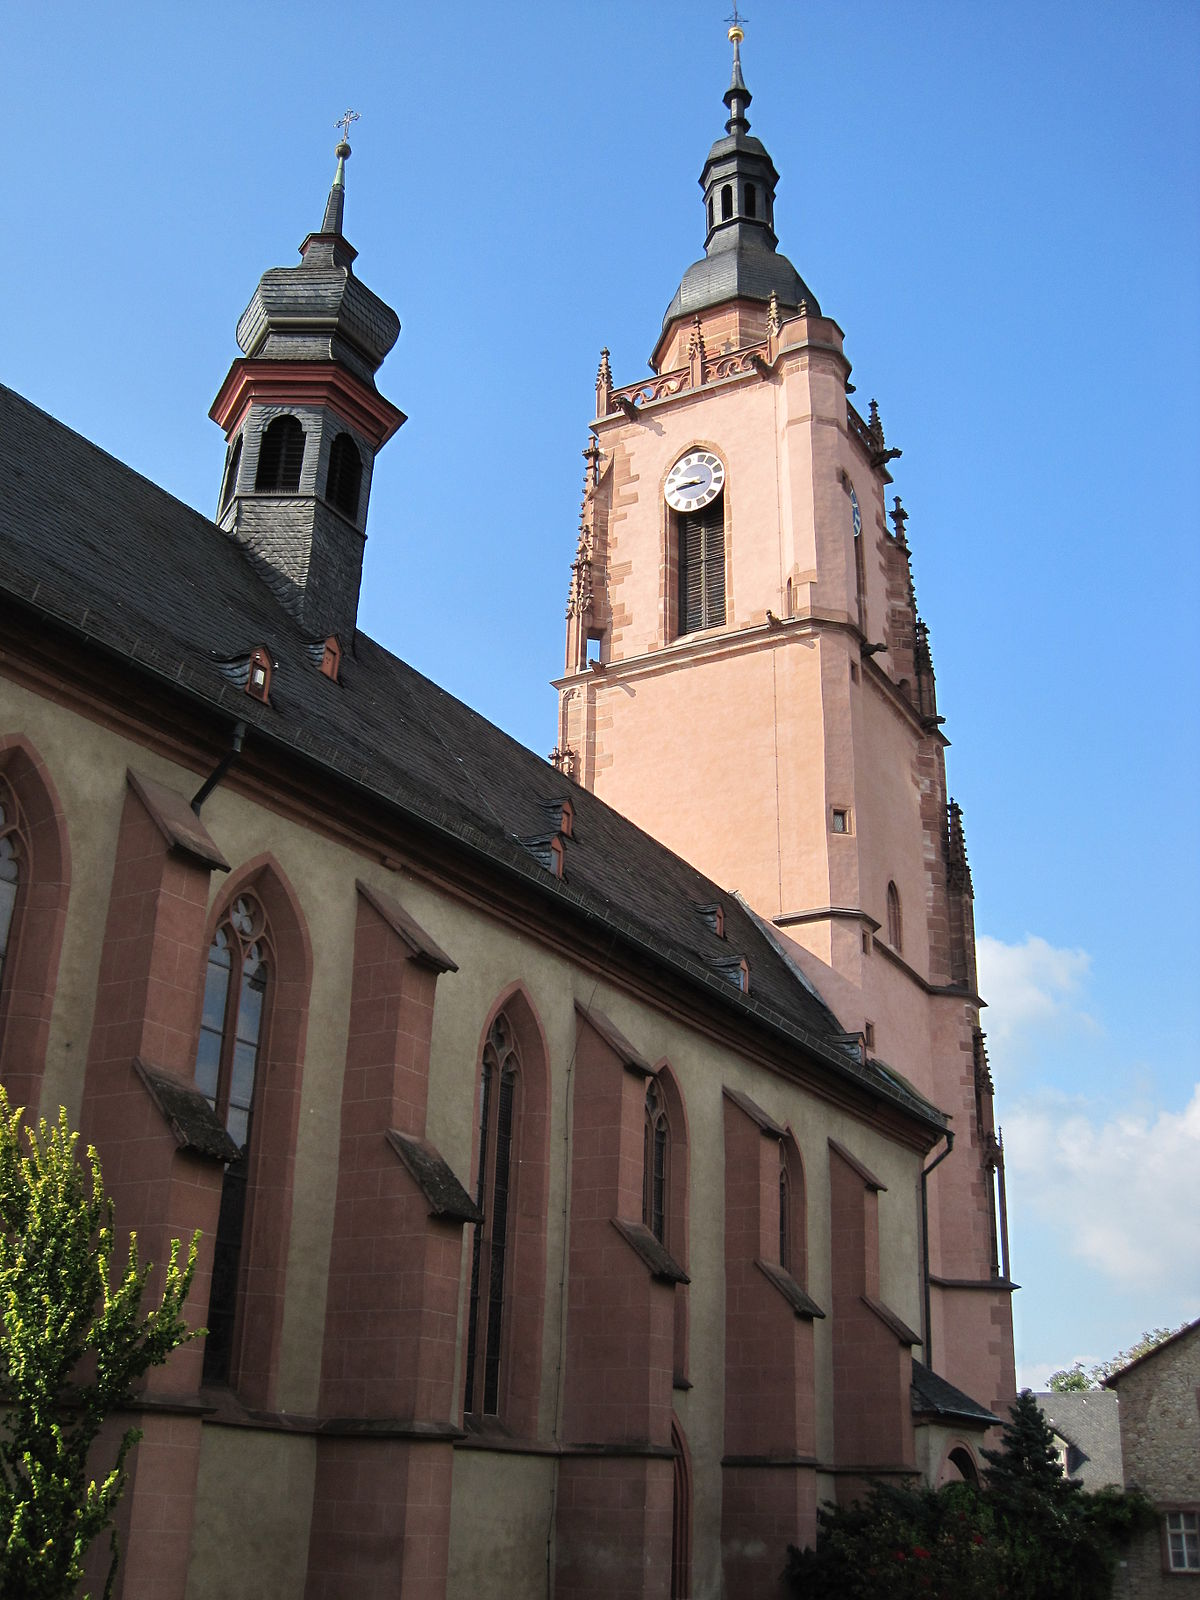 St. Peter und Paul (Eltville) - Wikipedia